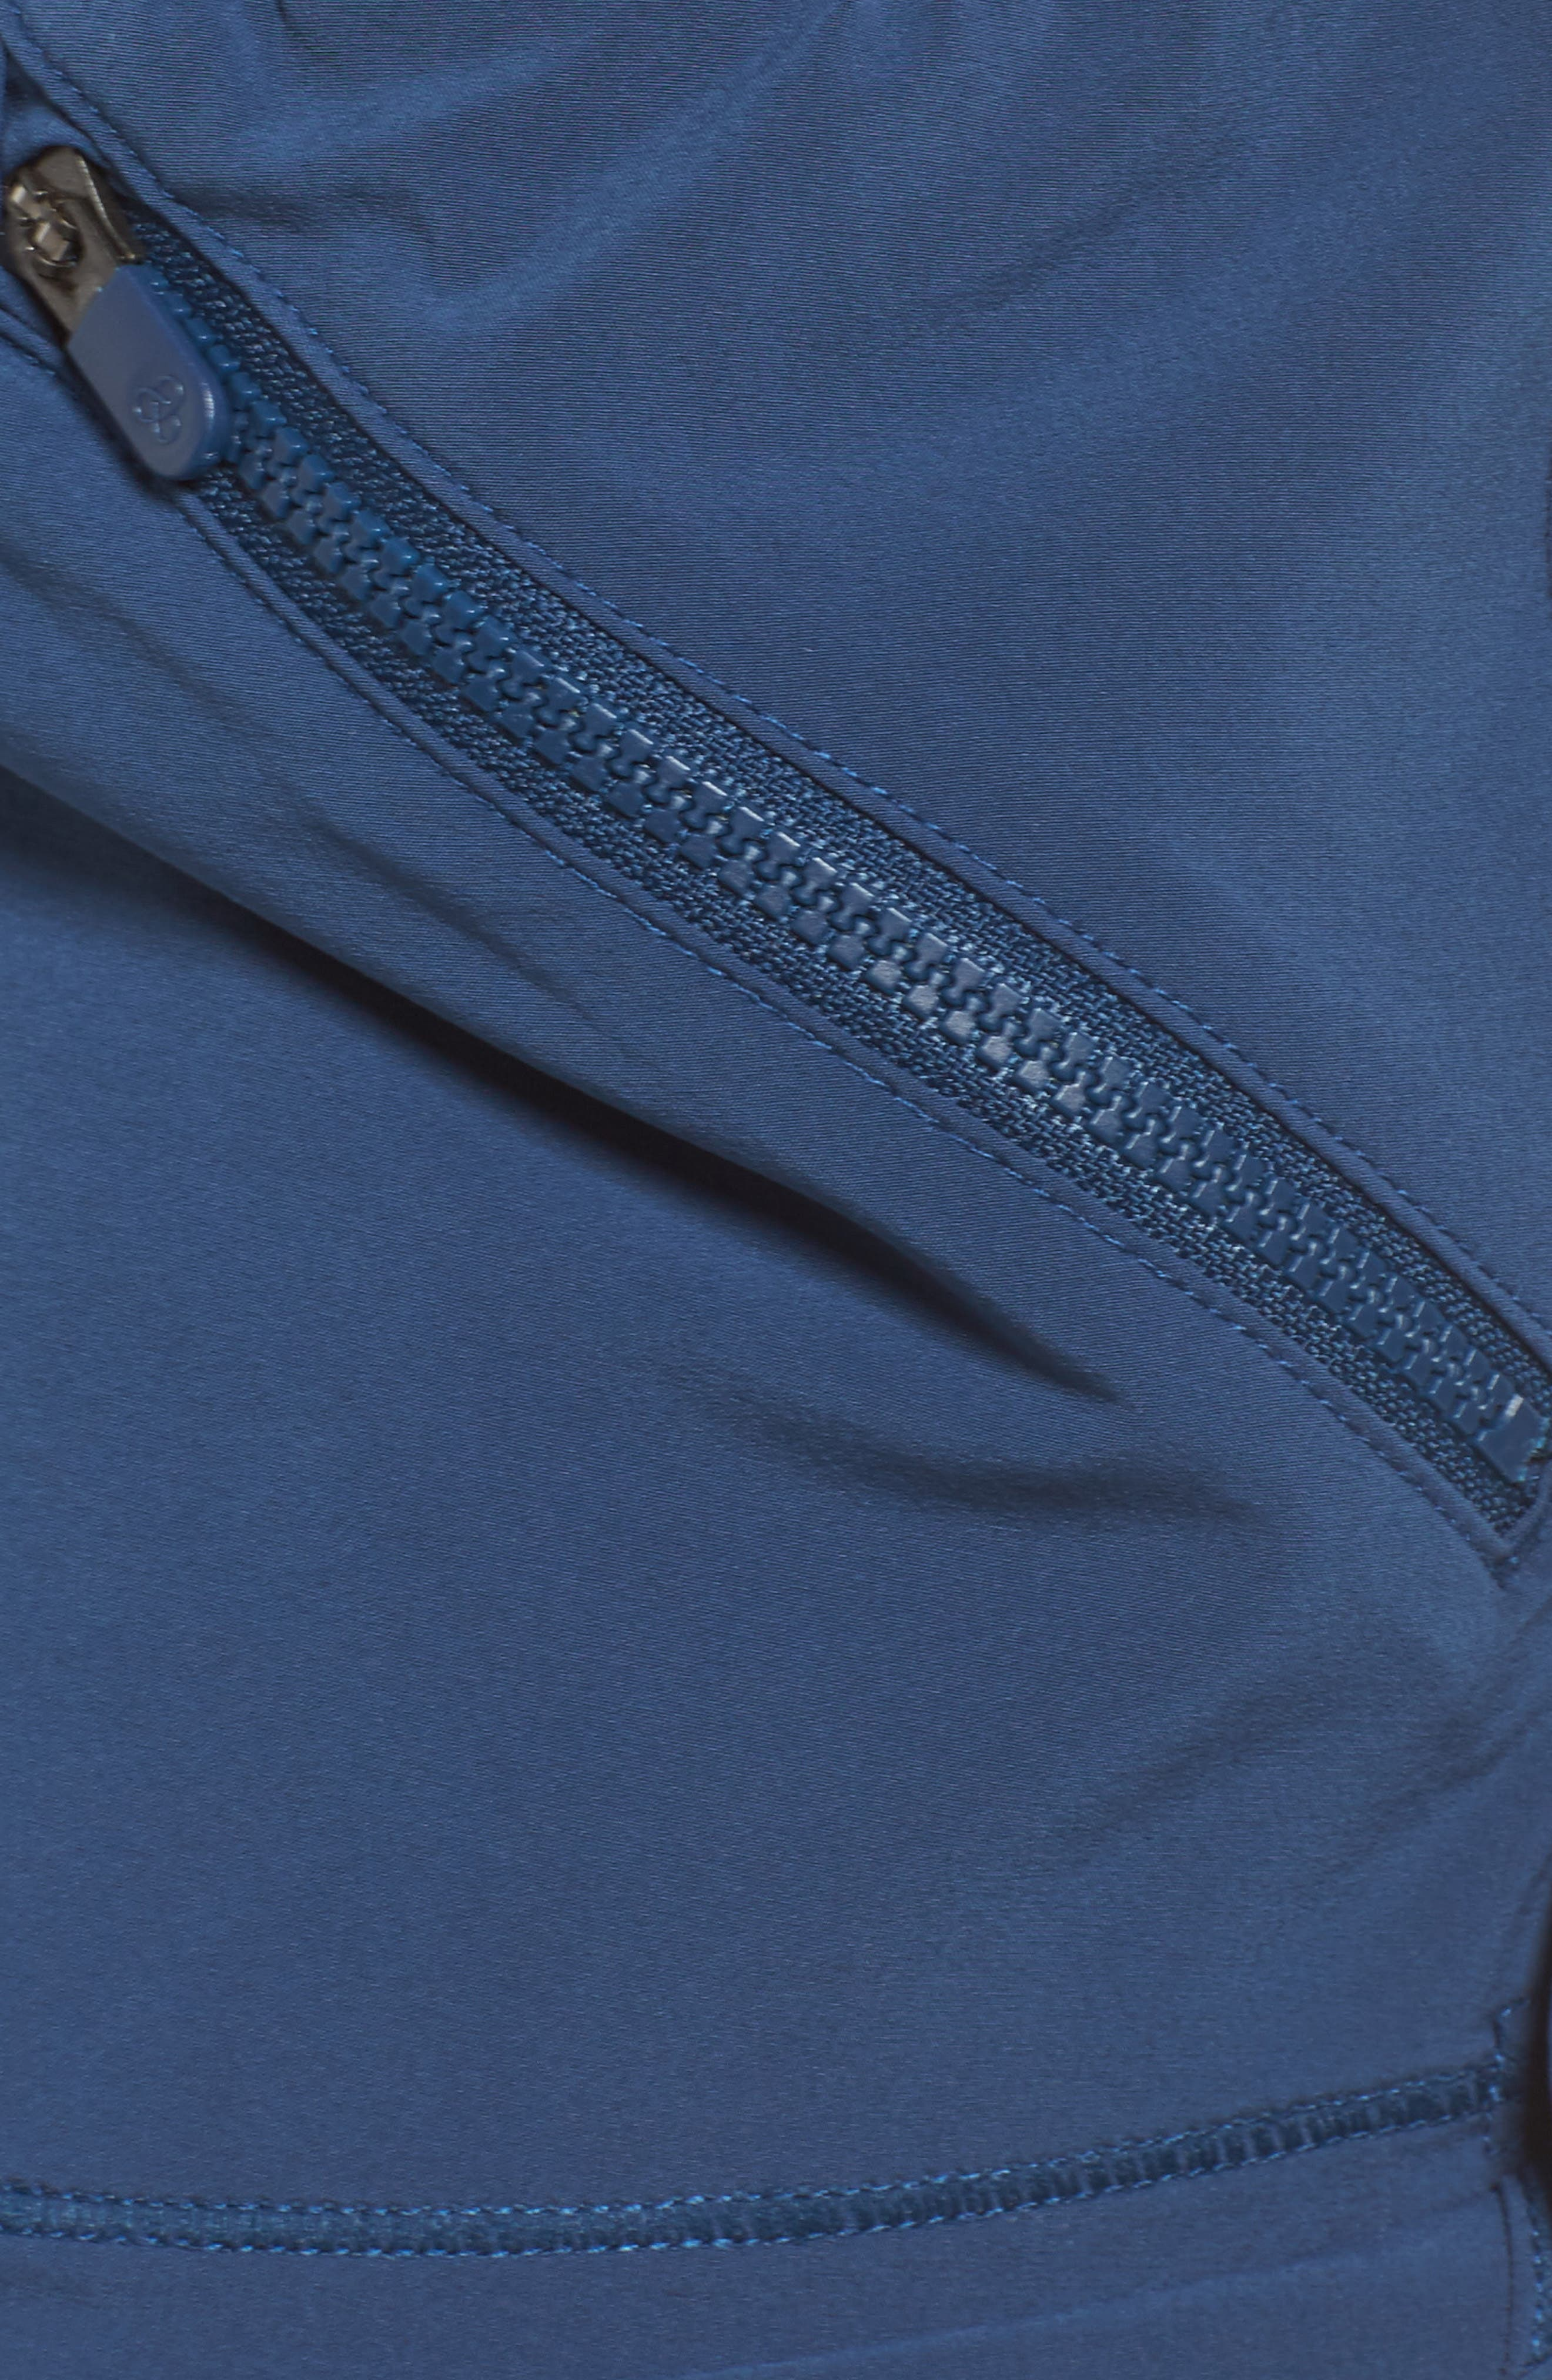 Switchback Shorts,                             Alternate thumbnail 40, color,